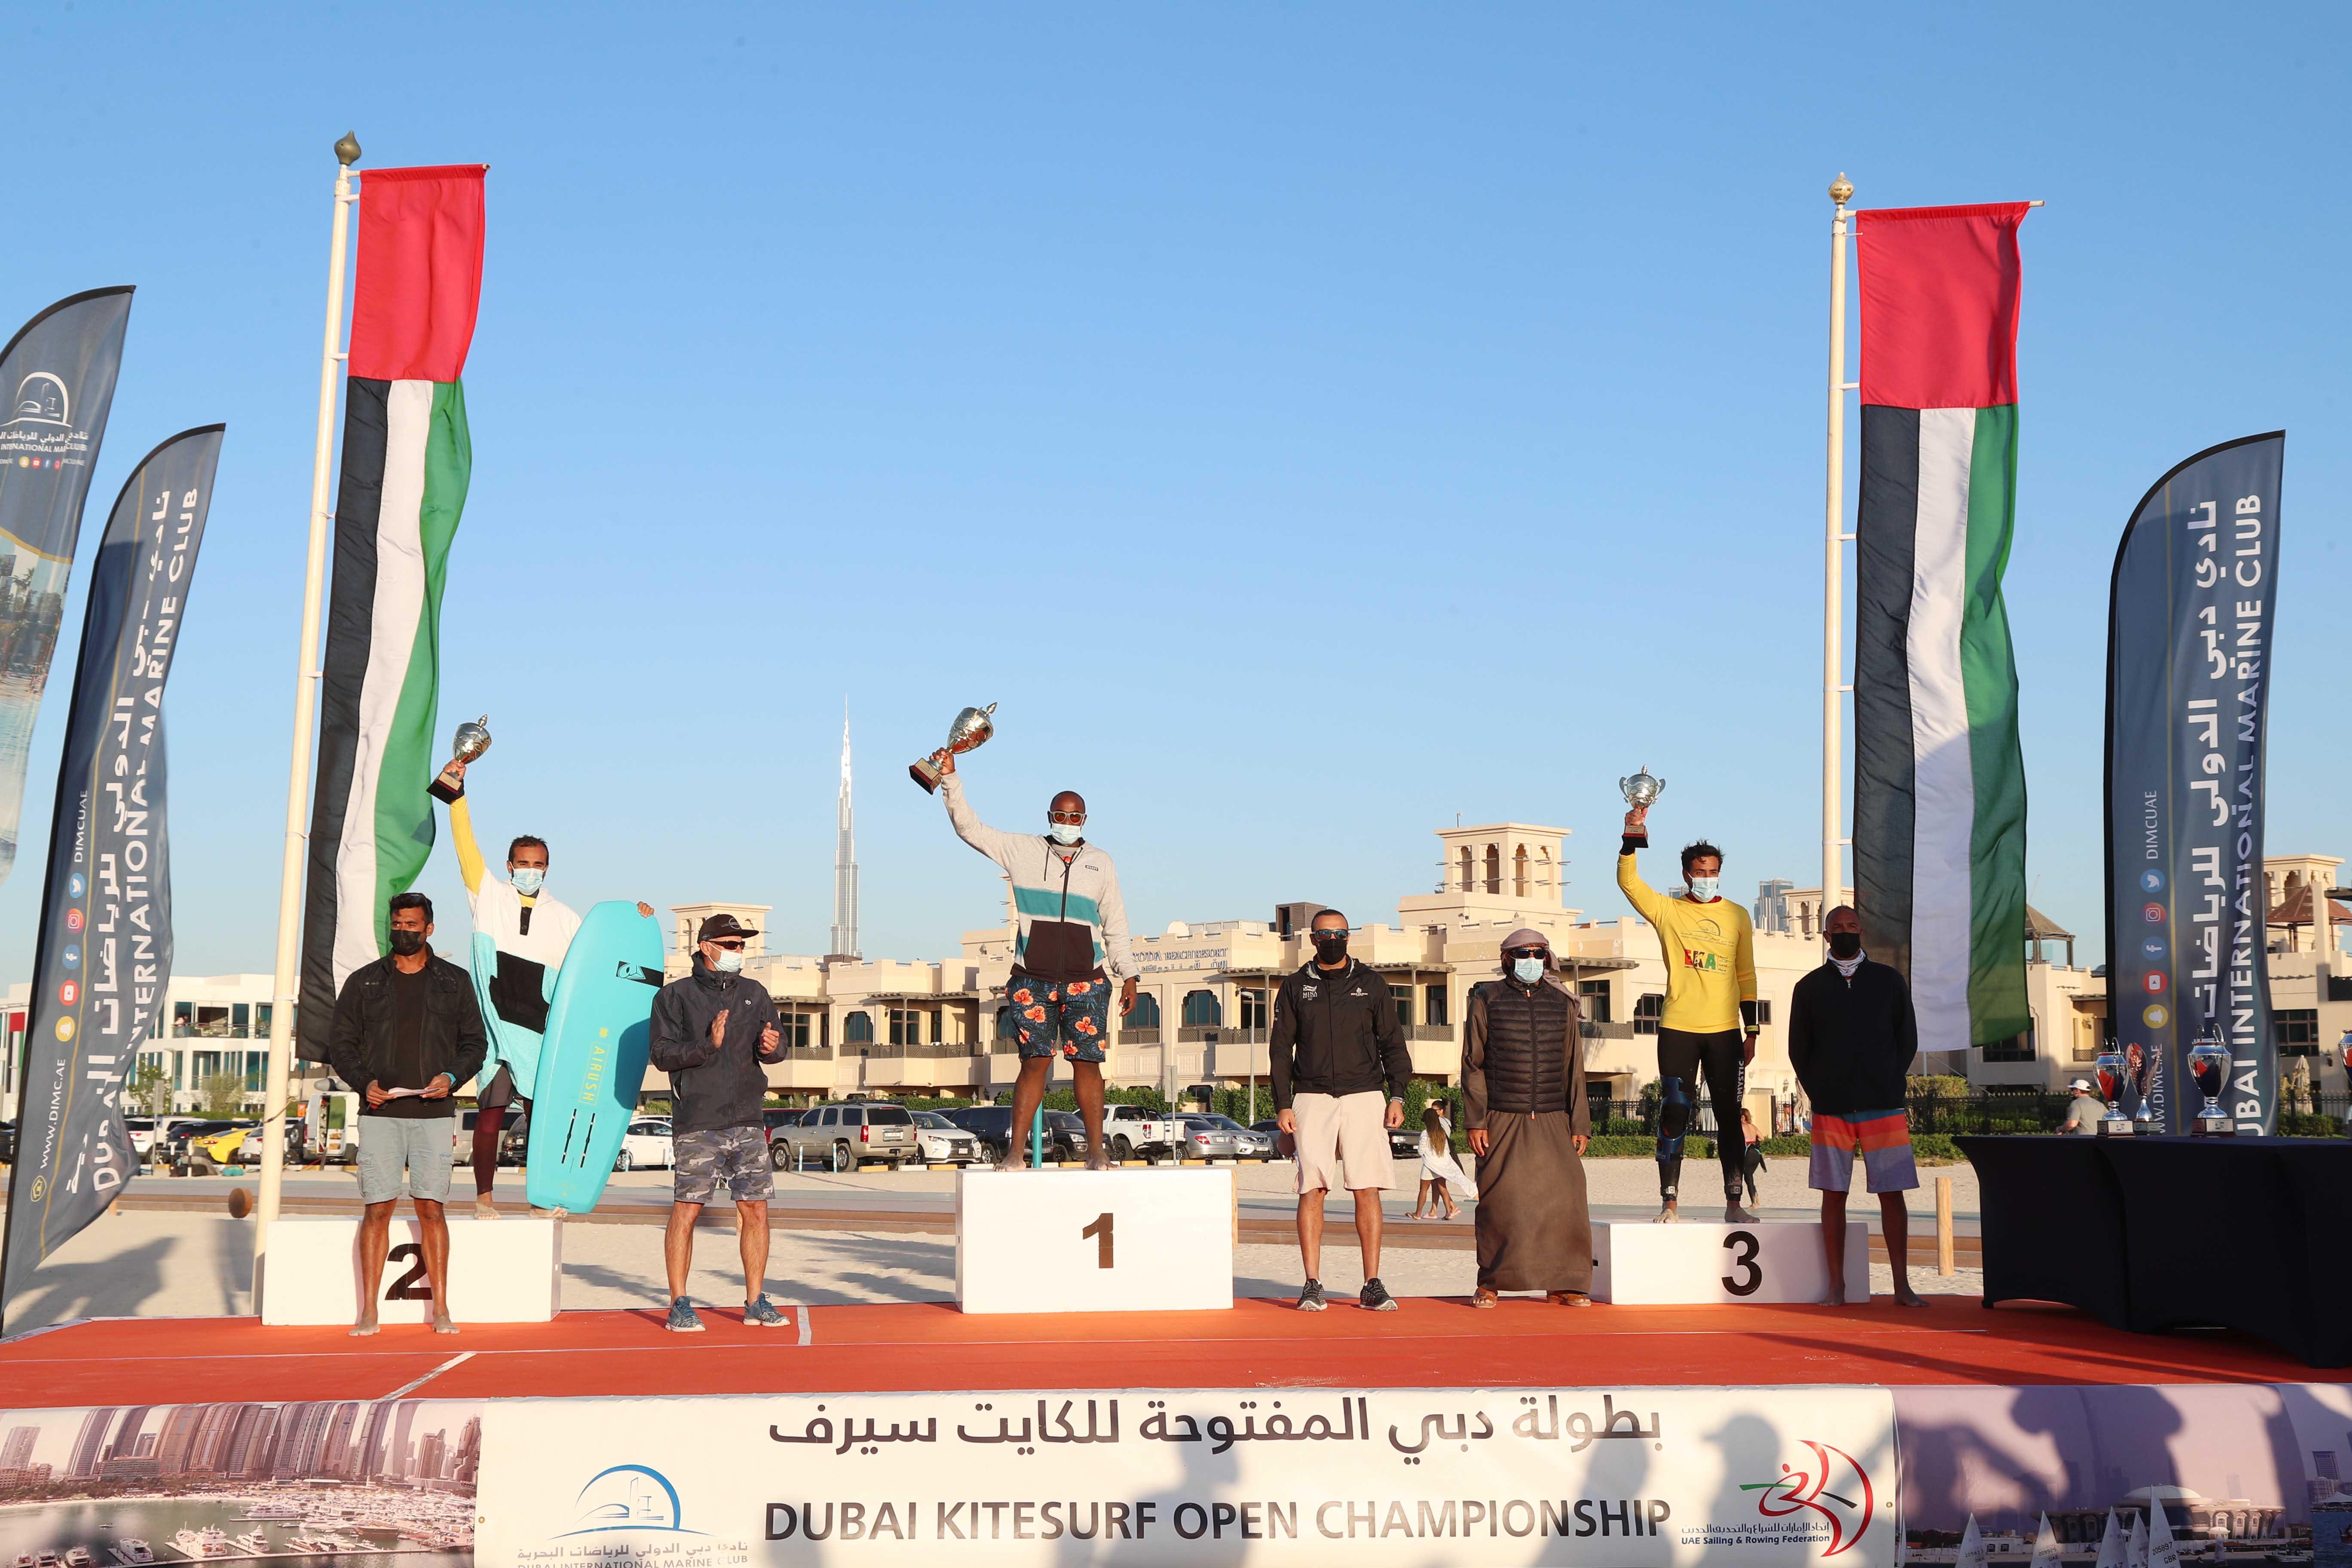 Suhail Al Marri shines at the conclusion of the Dubai Kitesurf Open